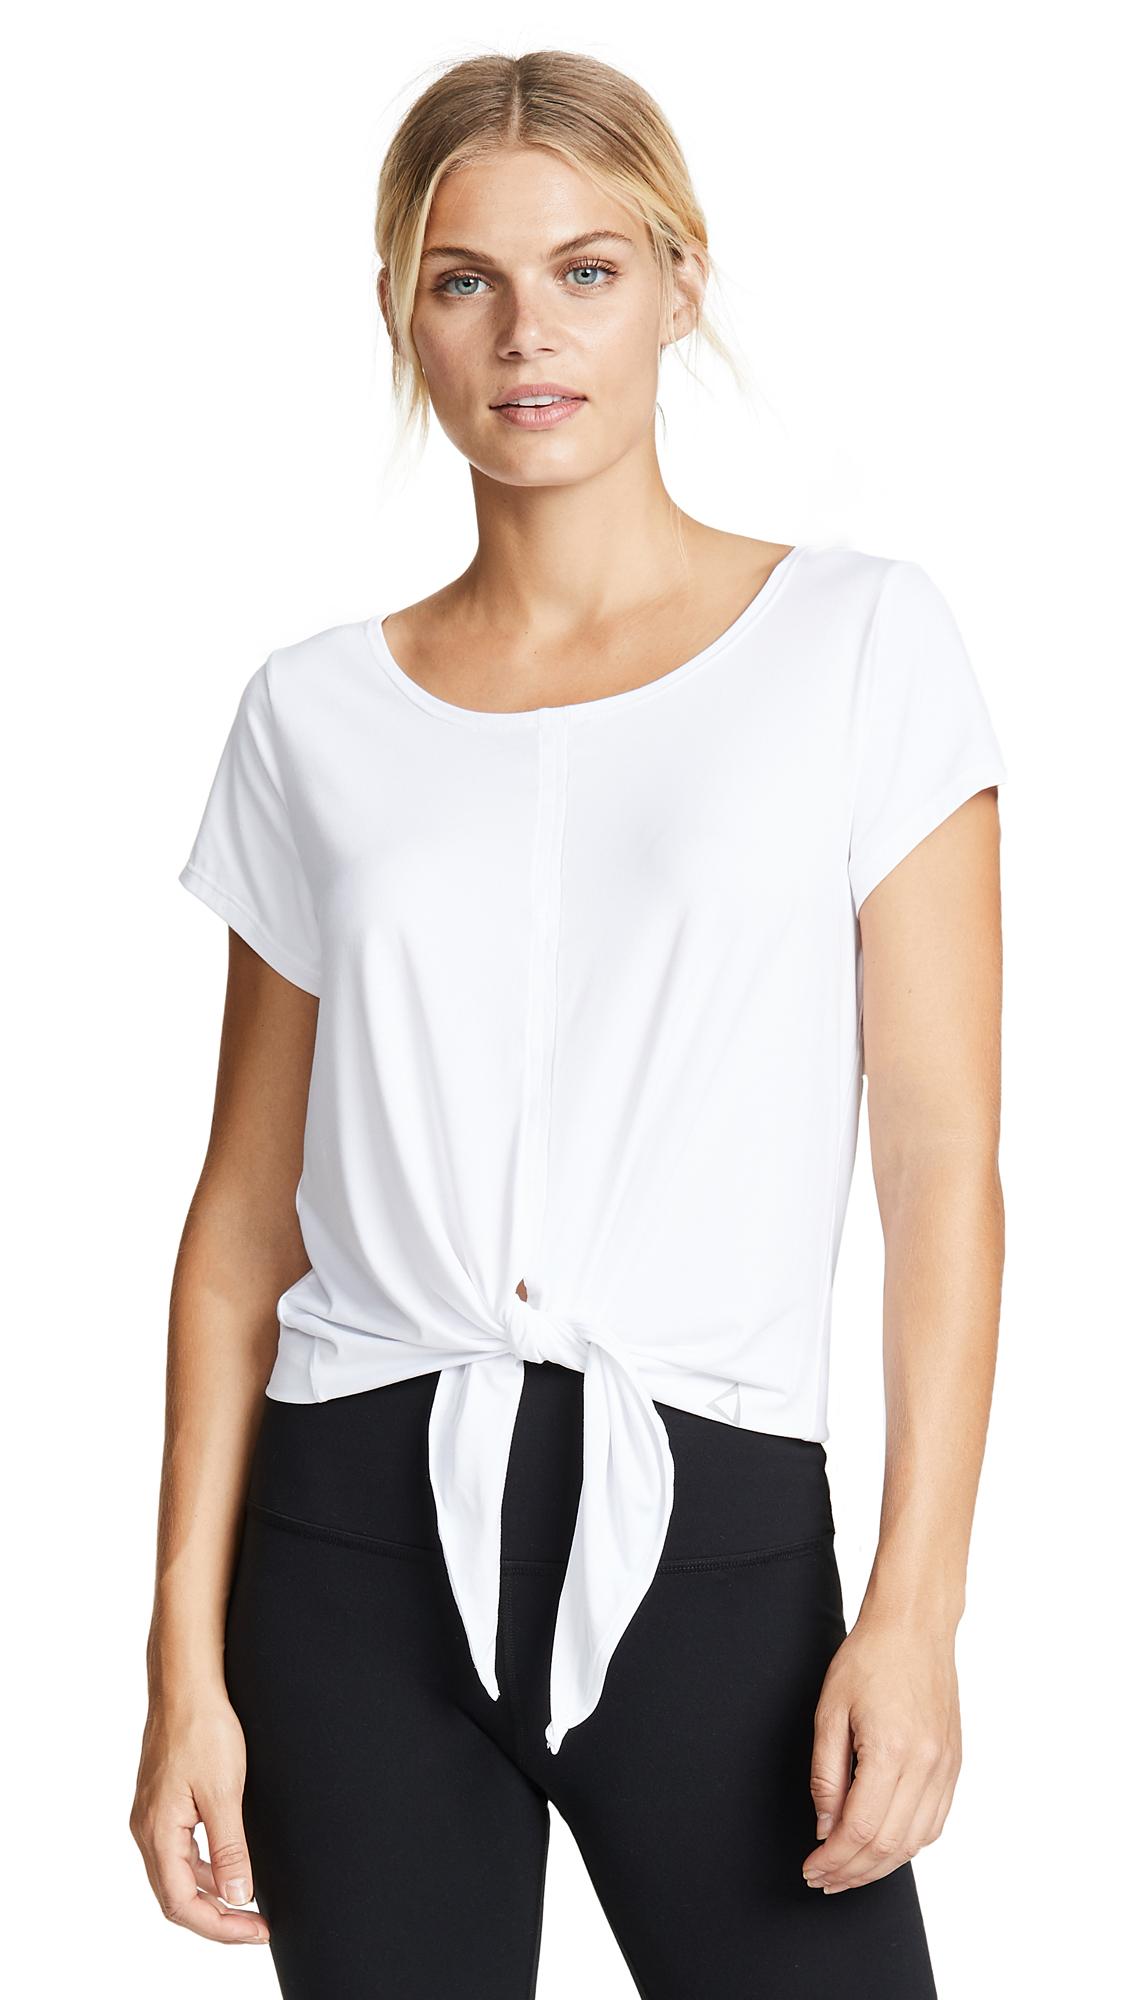 PRISMSPORT Short Sleeve Front Tie Top in White